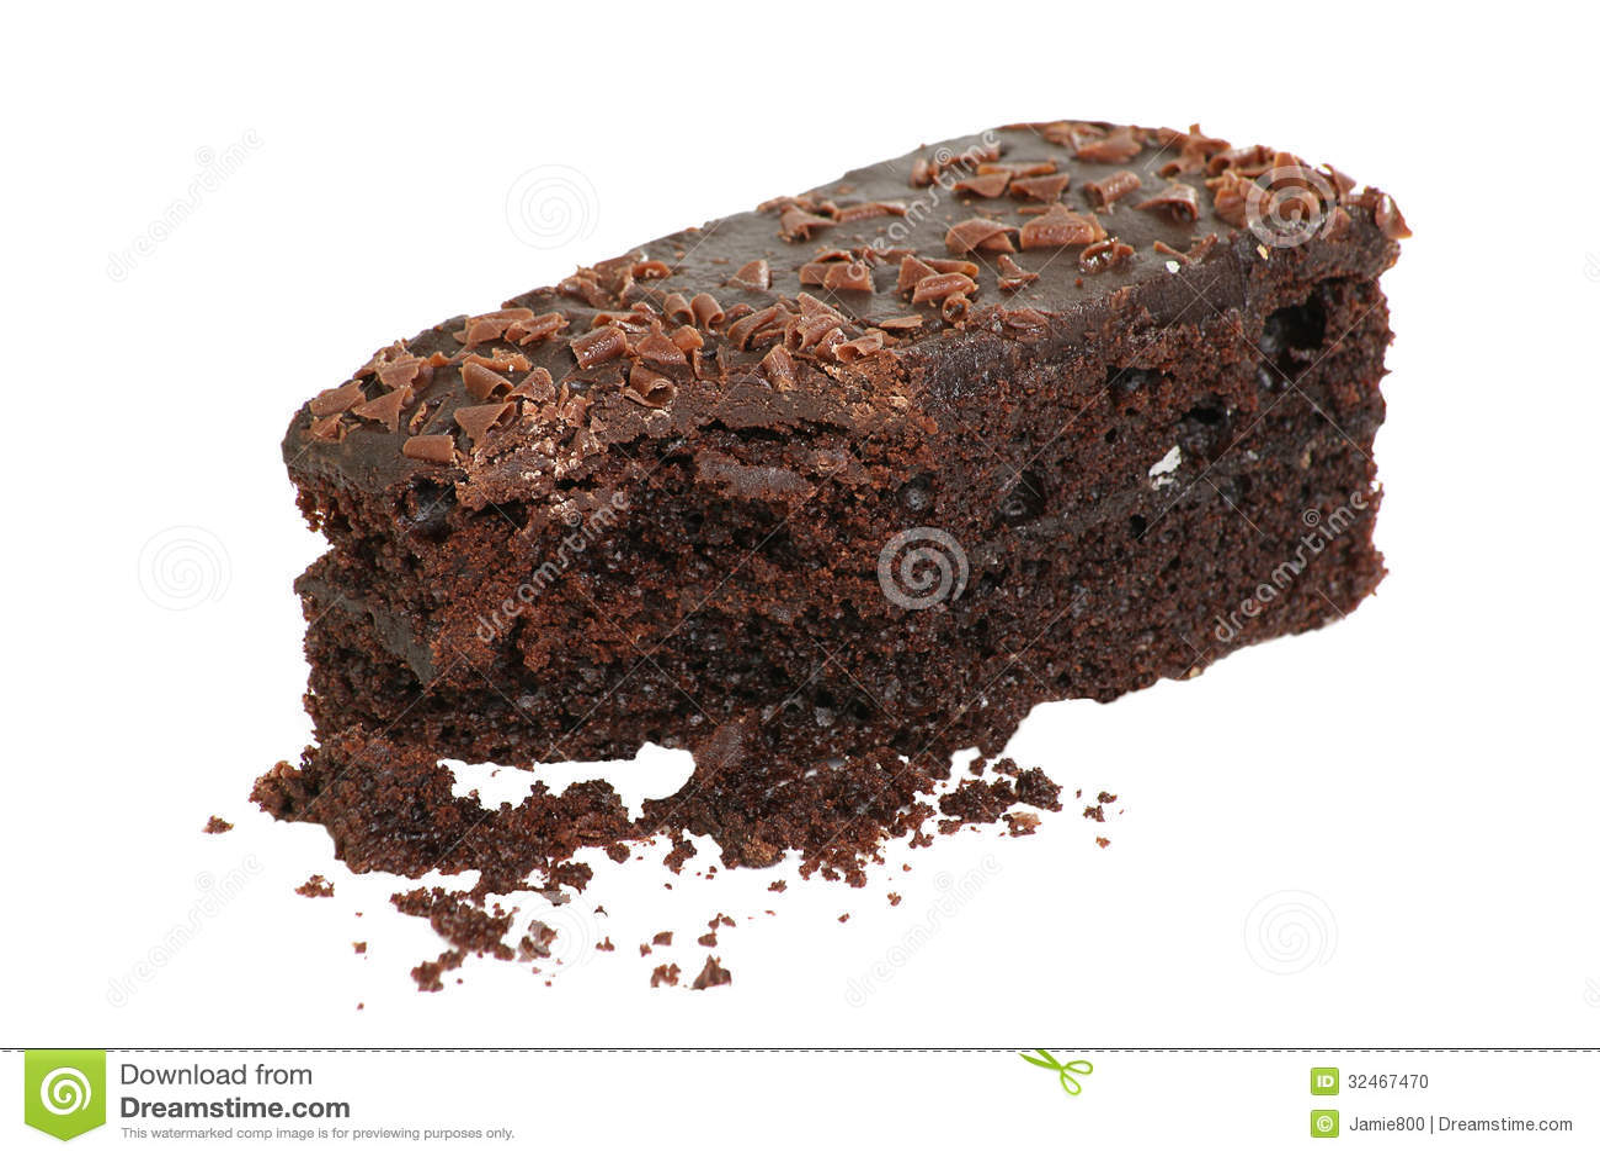 Fudge Cake Slice White Background